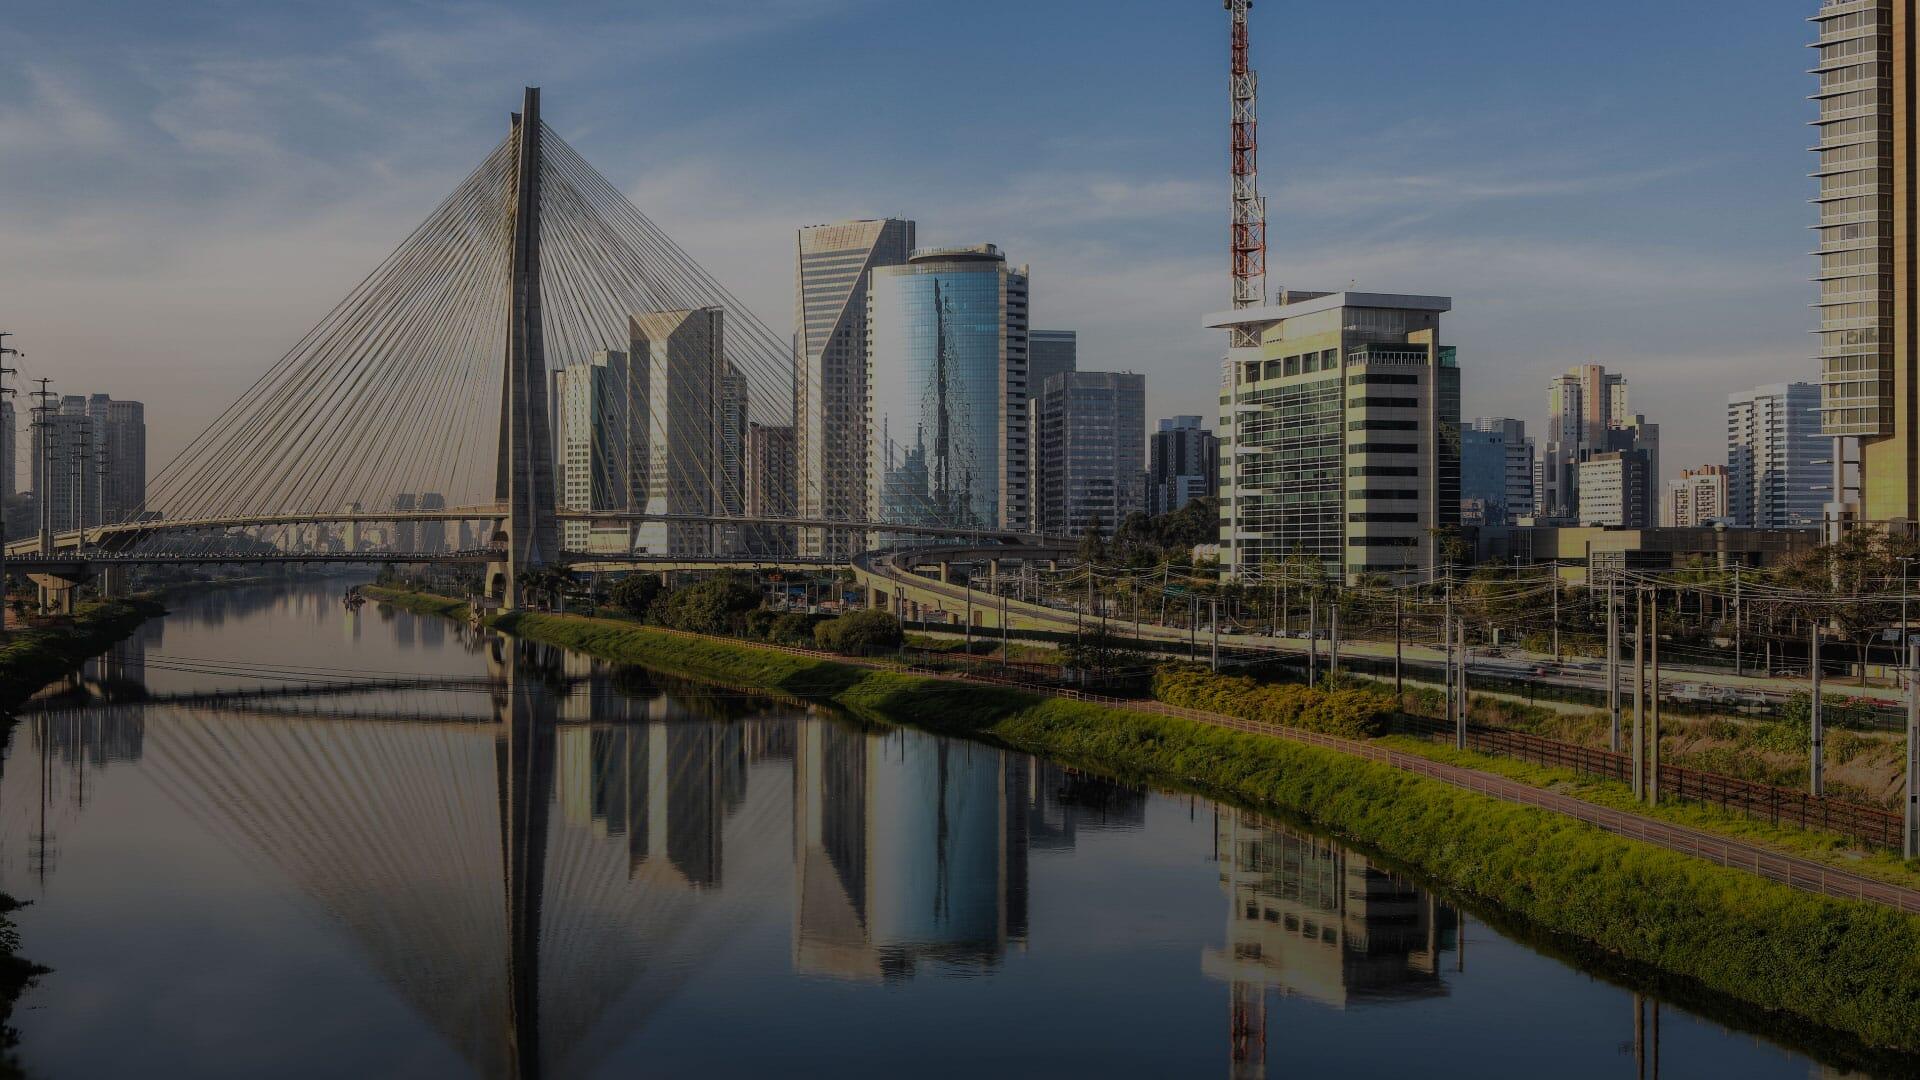 Coronavírus e seus possíveis impactos na economia brasileira